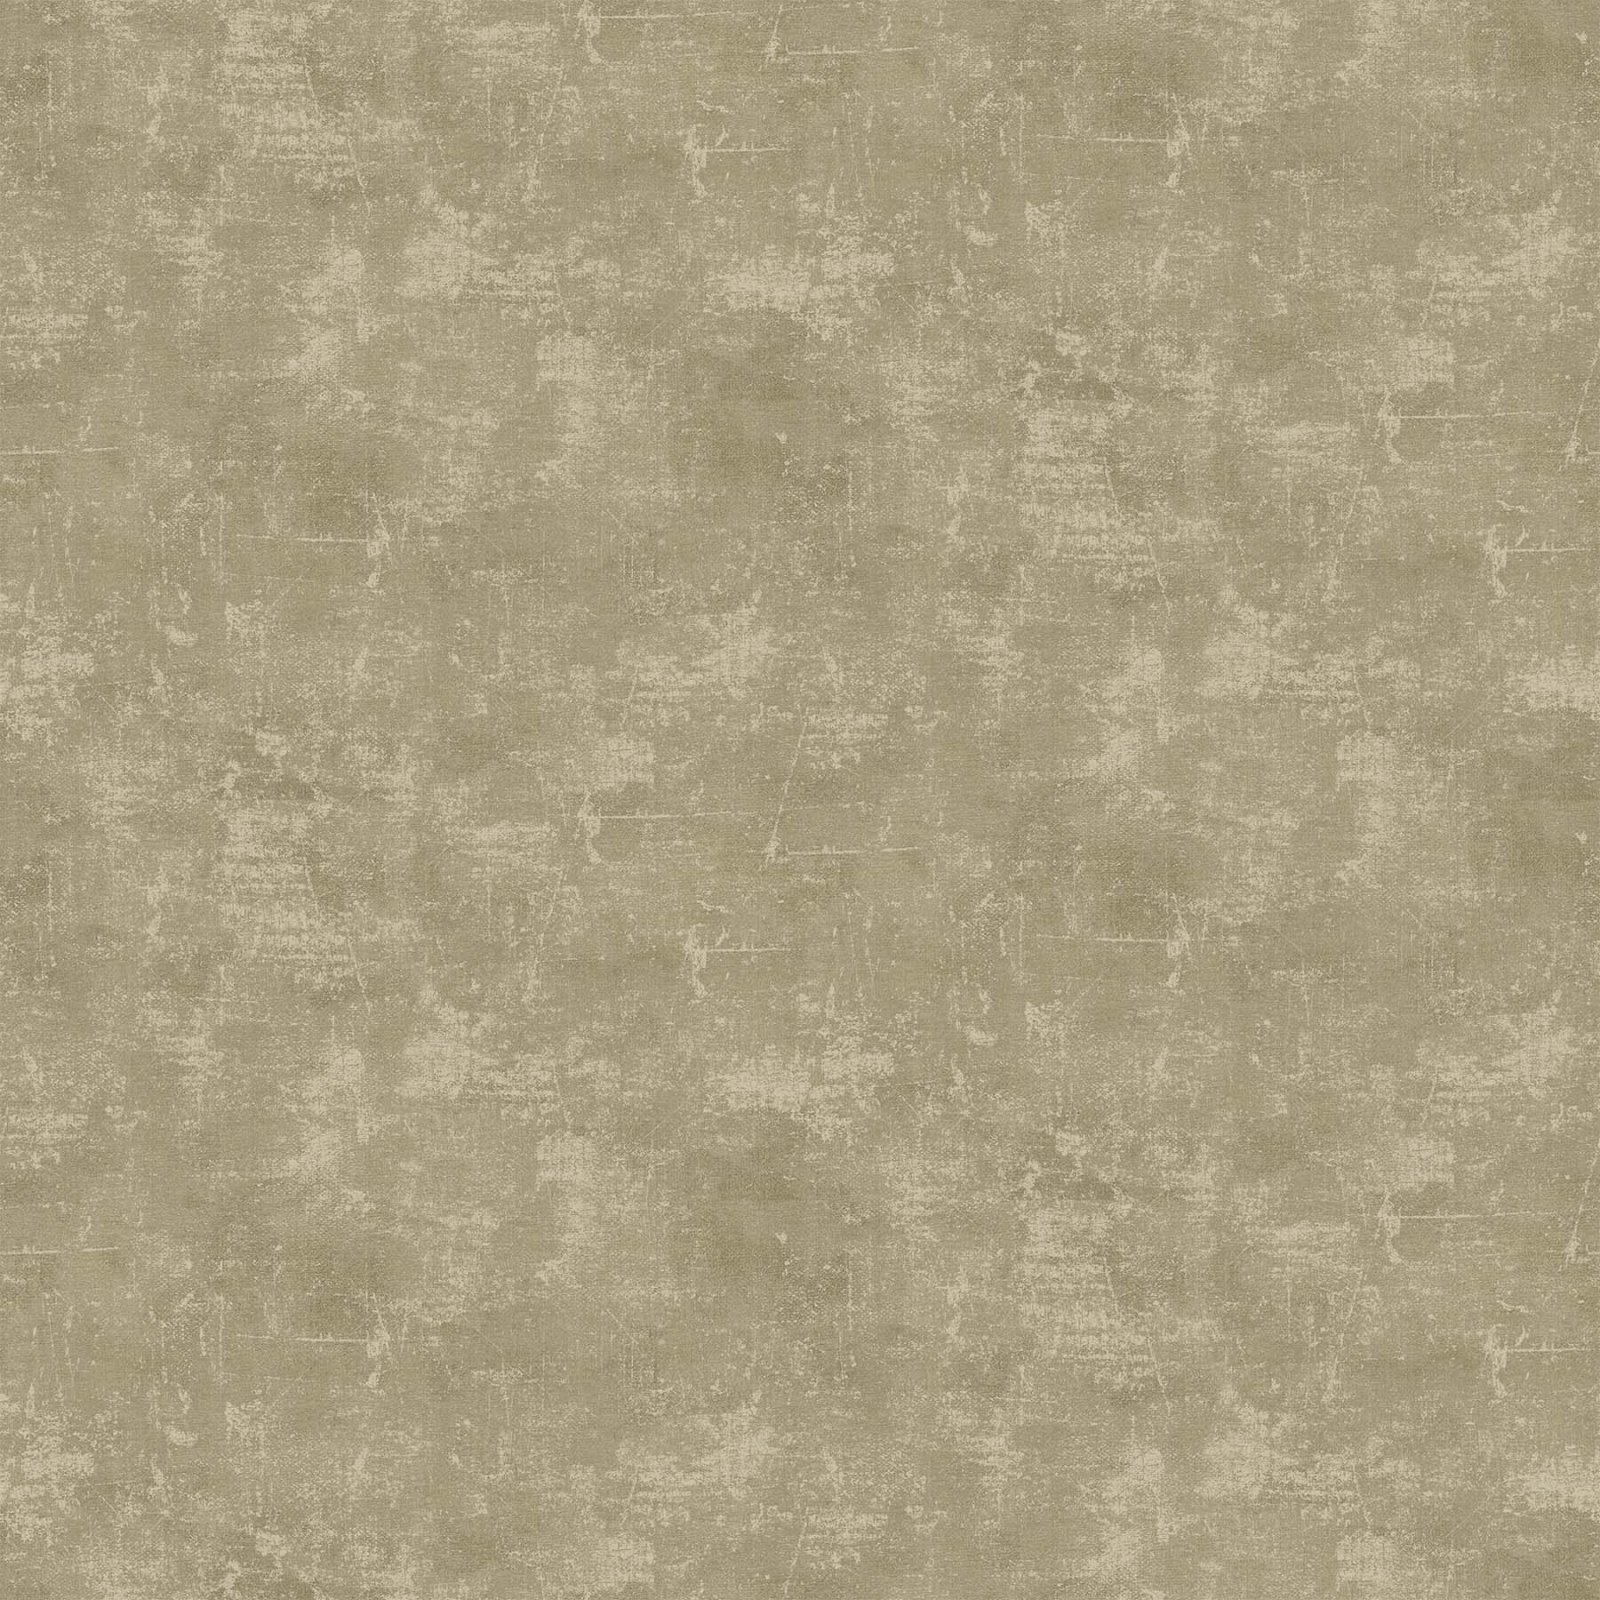 Canvas 9030-14 by Northcott Fabrics